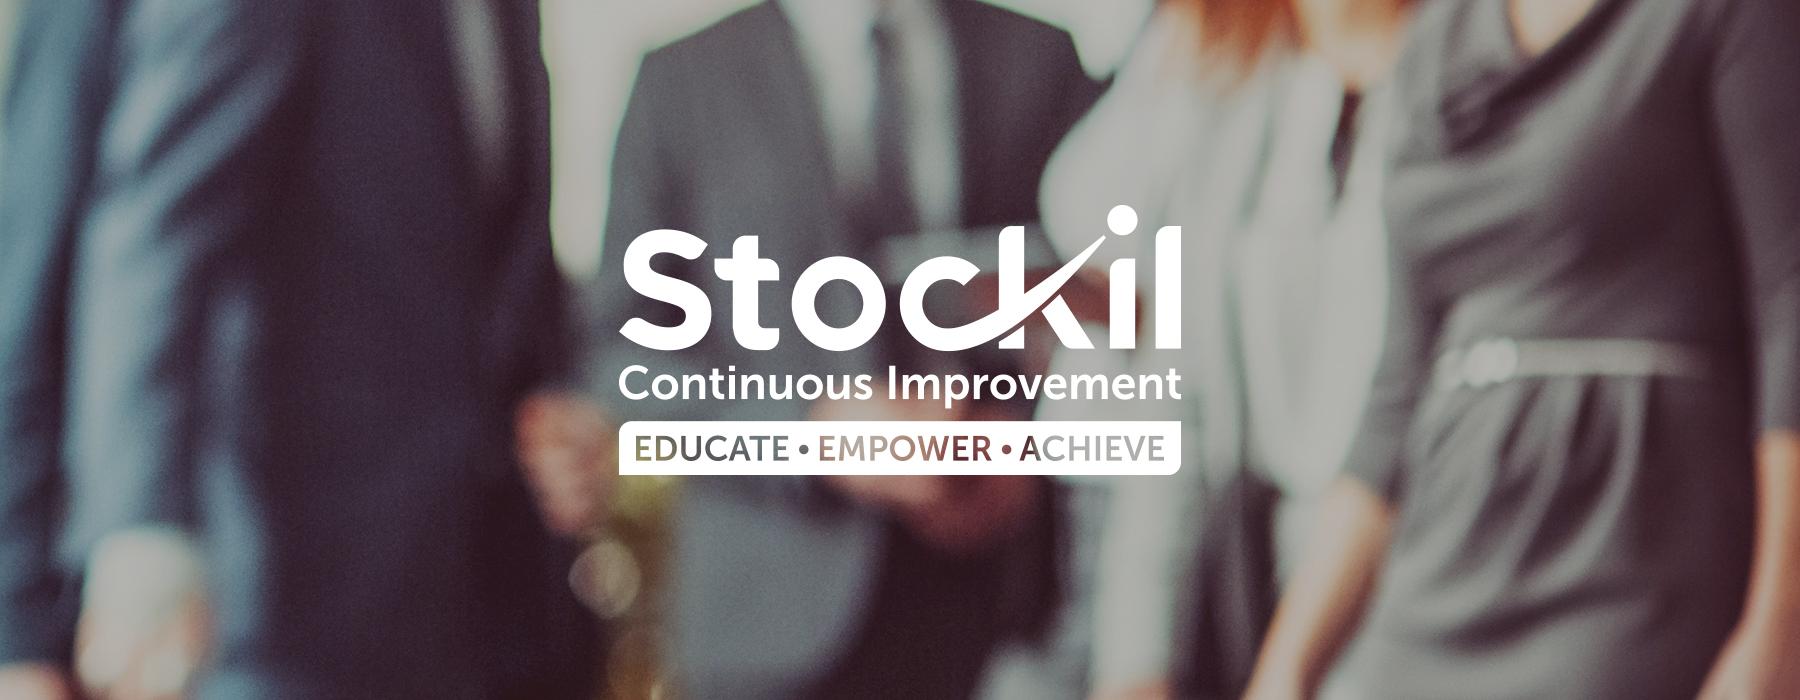 Stockil Continuous Improvement